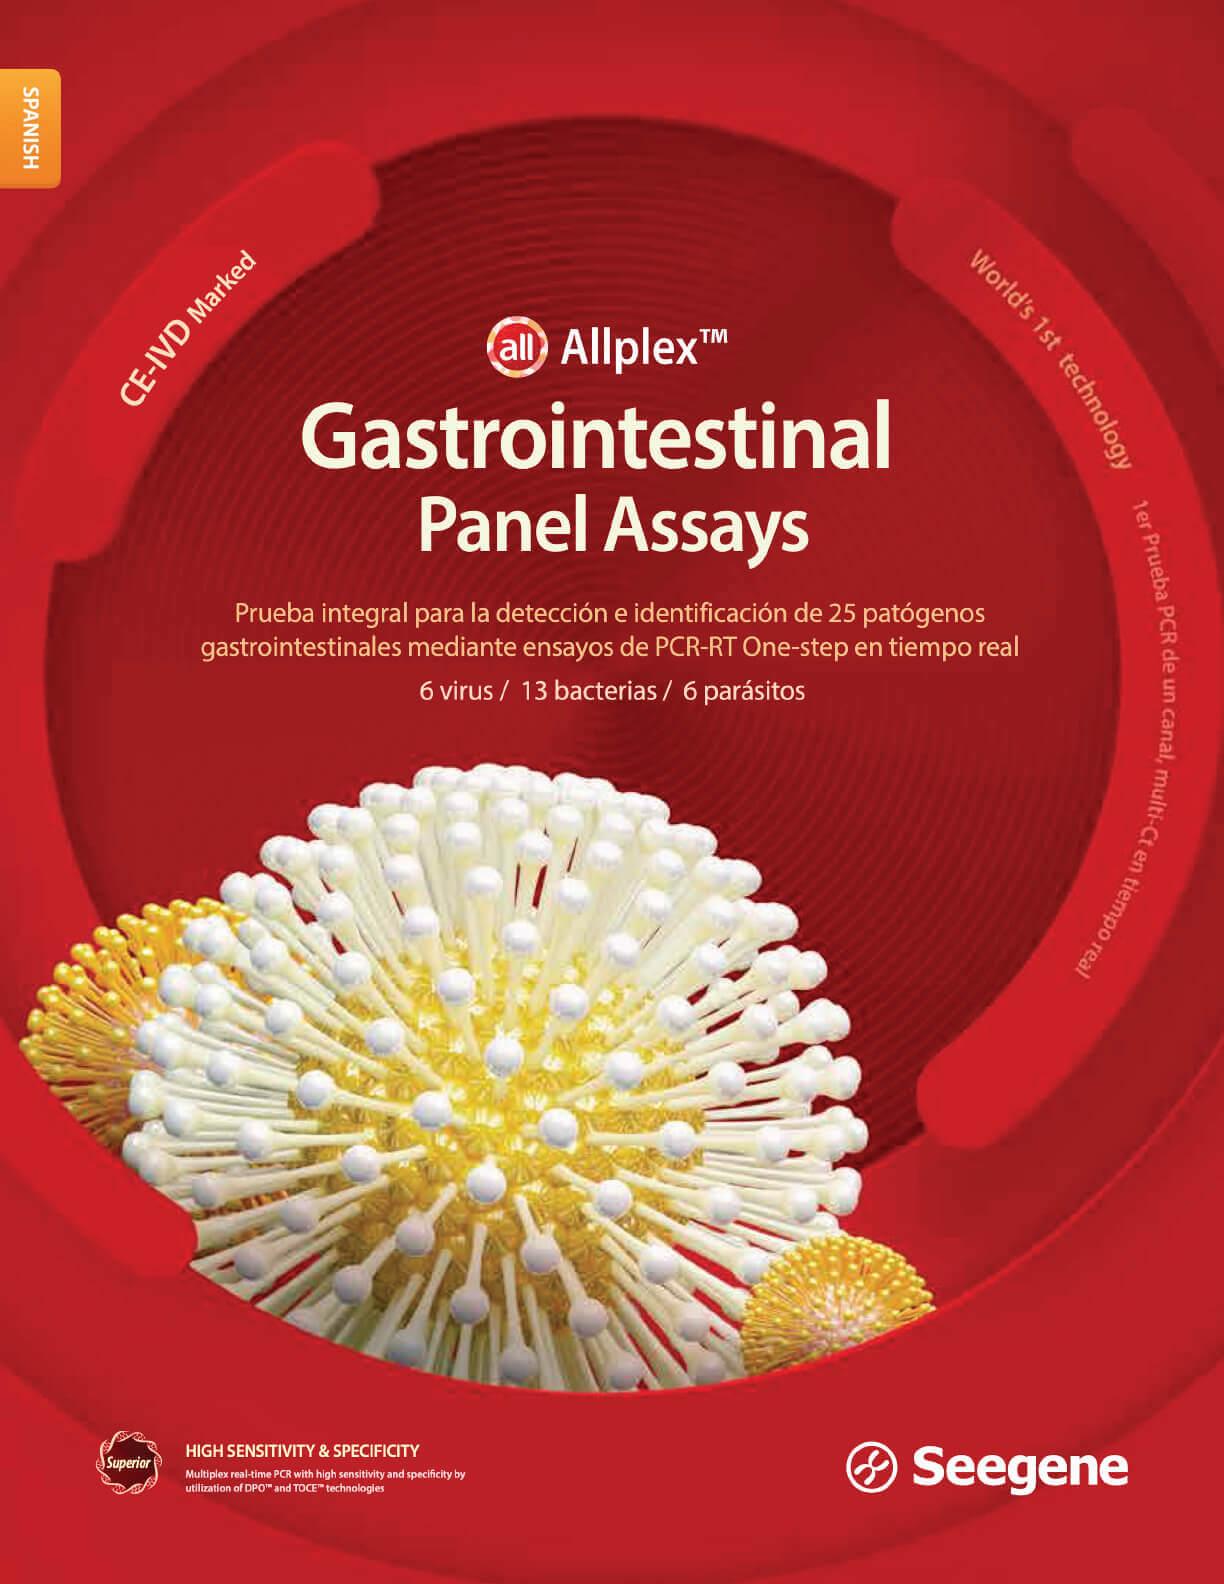 Gastrointestinal Panel Assays